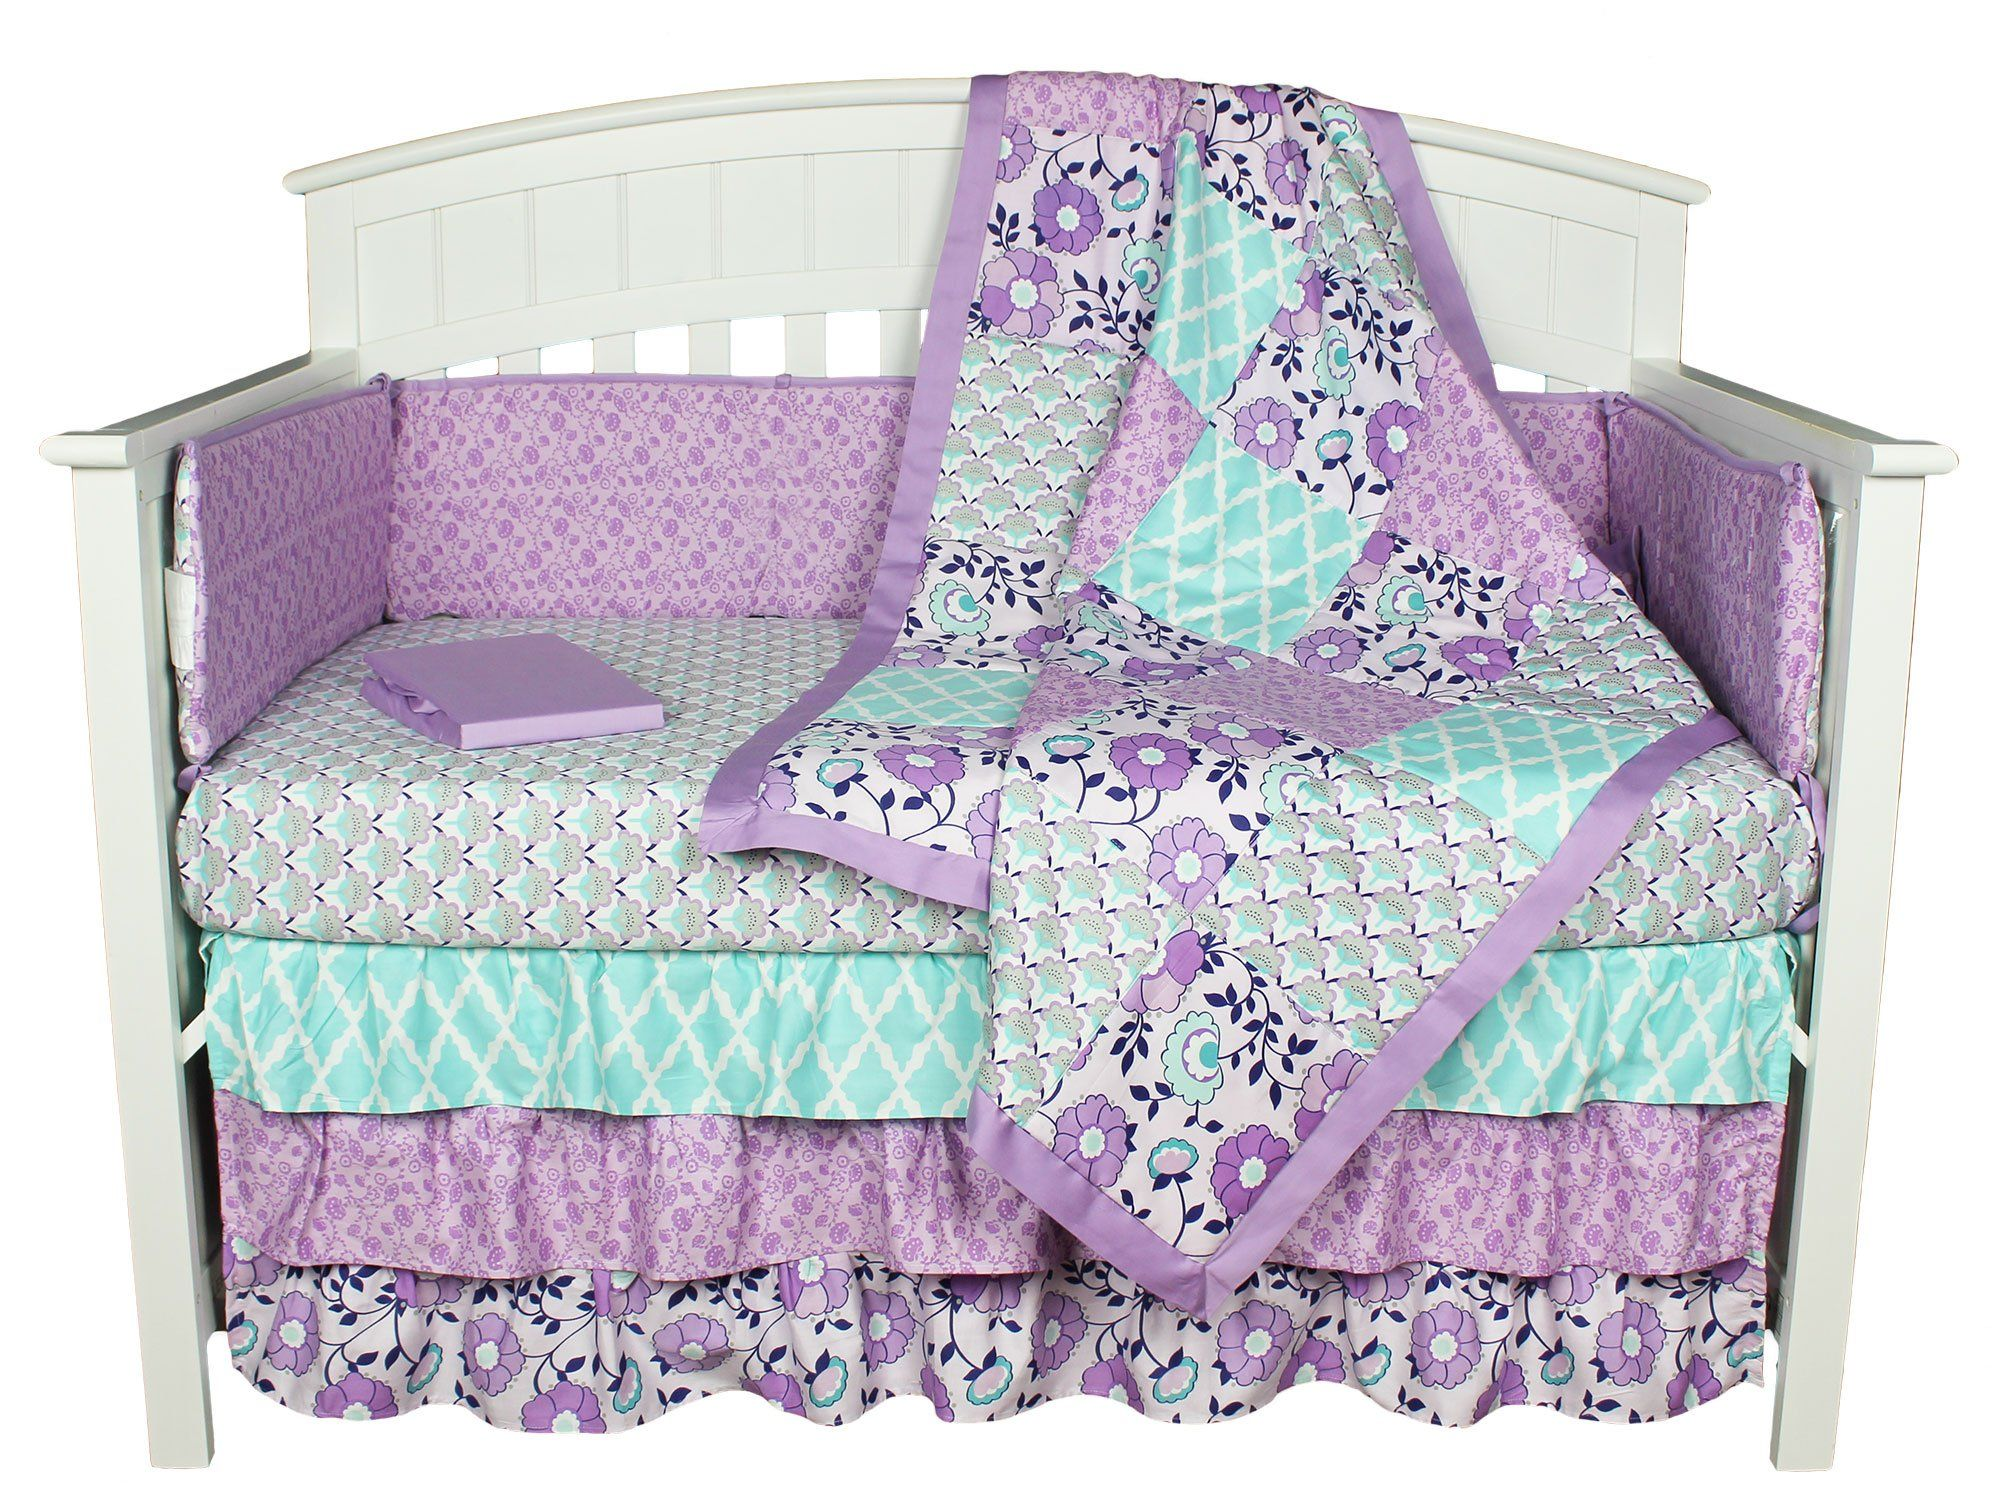 Robot Check Baby Bedding Sets Purple Crib Bedding Baby Girl